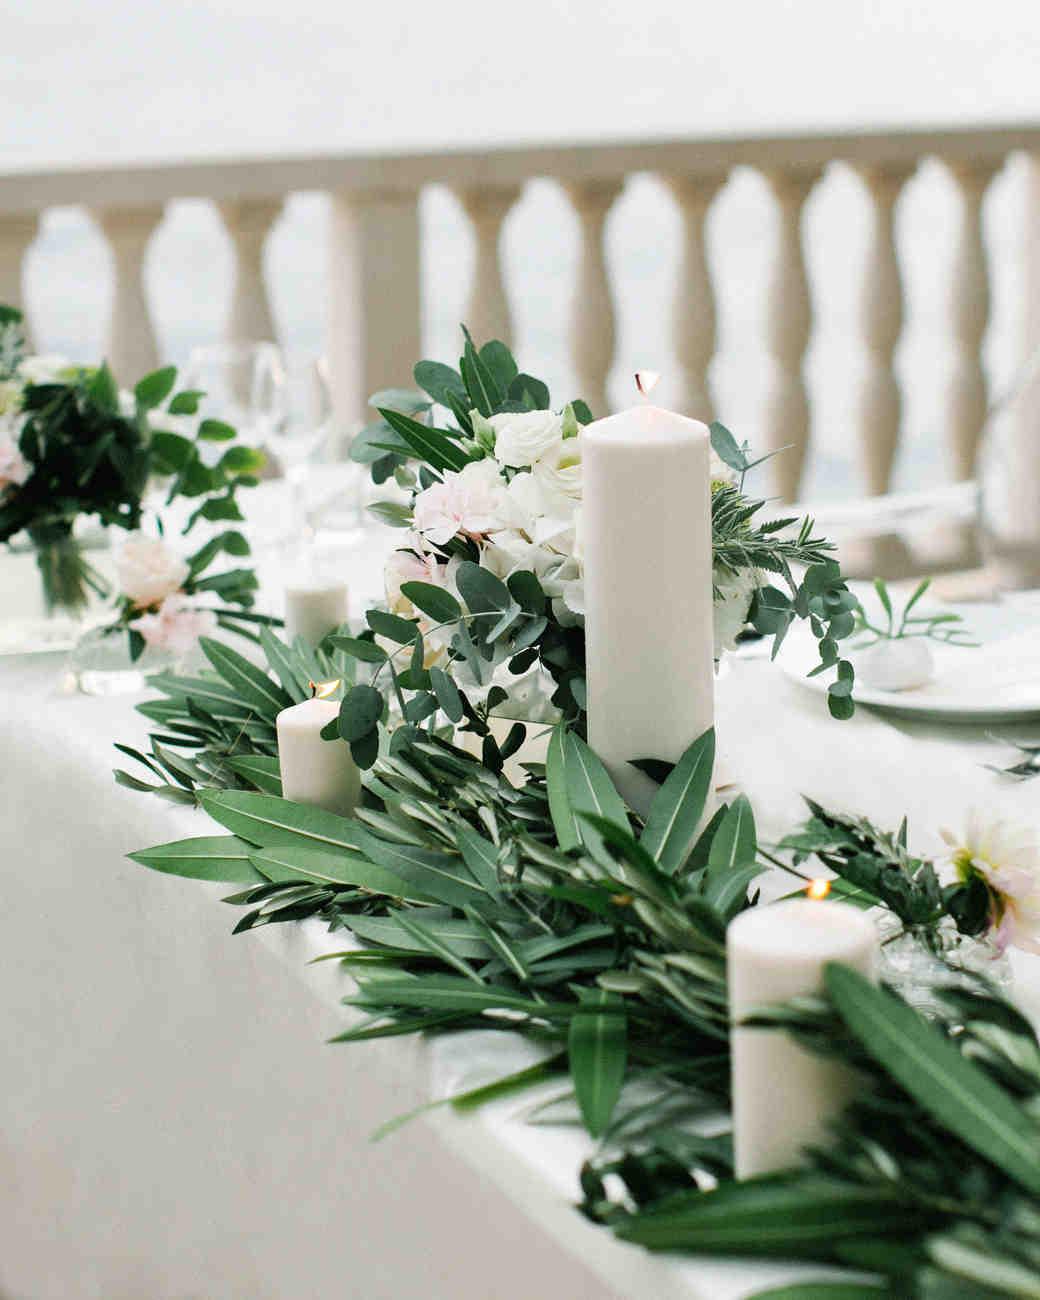 melissa-mike-wedding-centerpieces-0190-s112764-0316.jpg